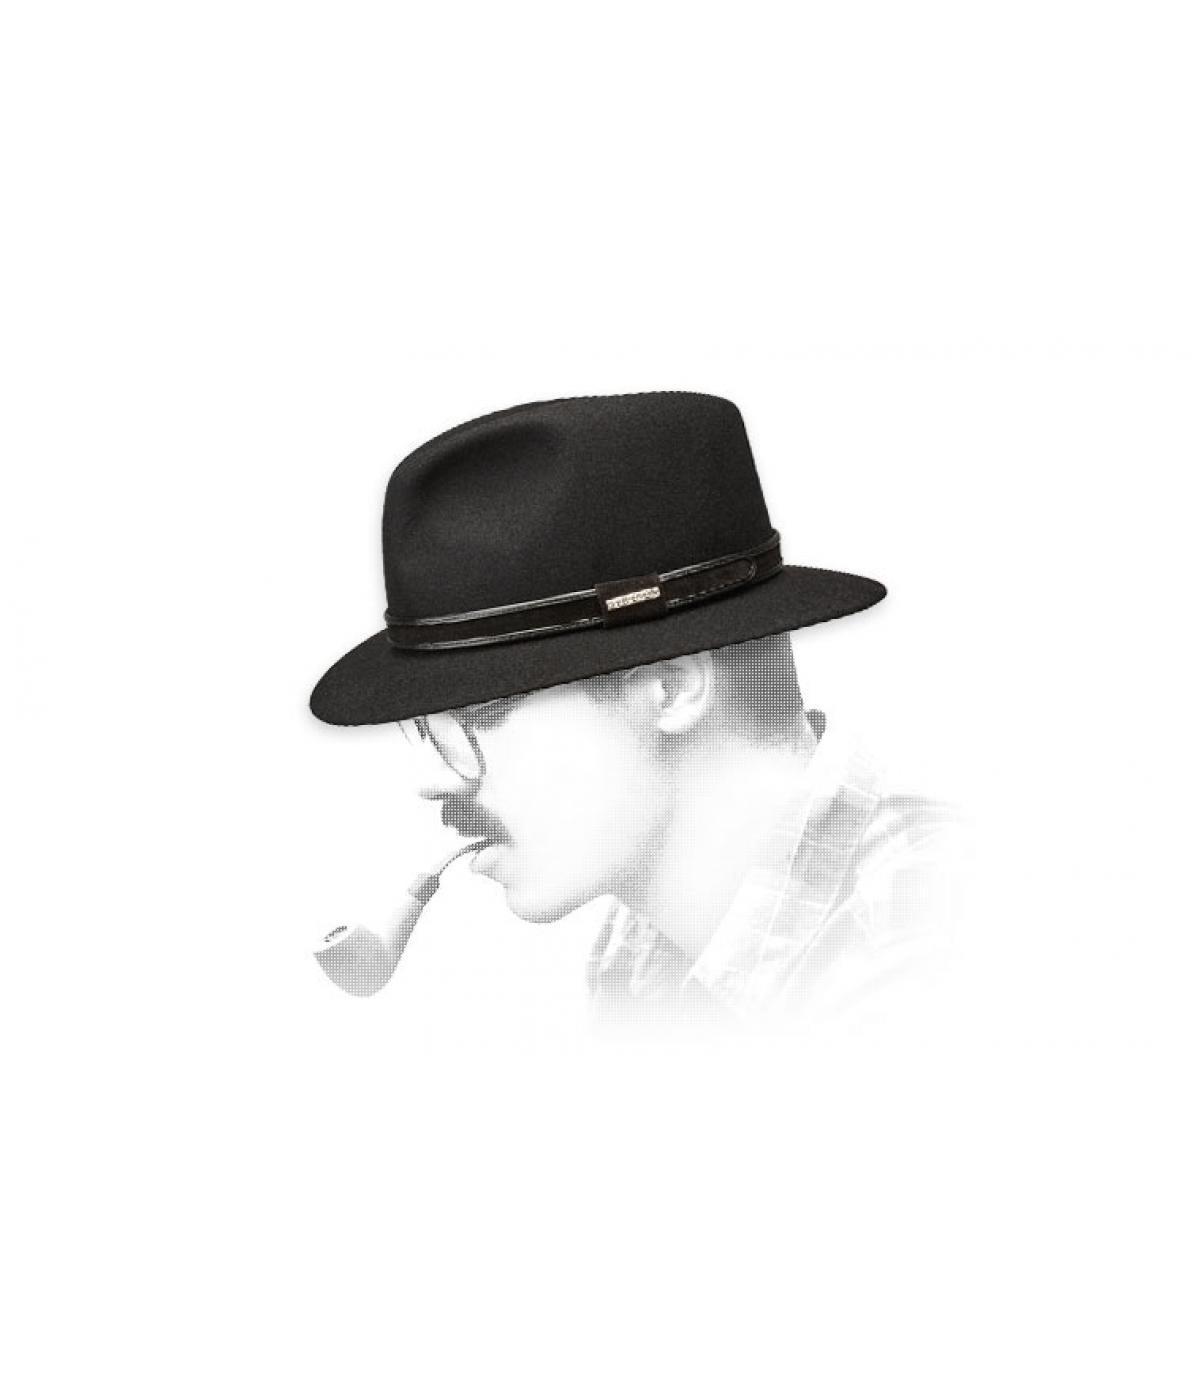 sombrero de fieltro negro de fieltro Stetson conejo